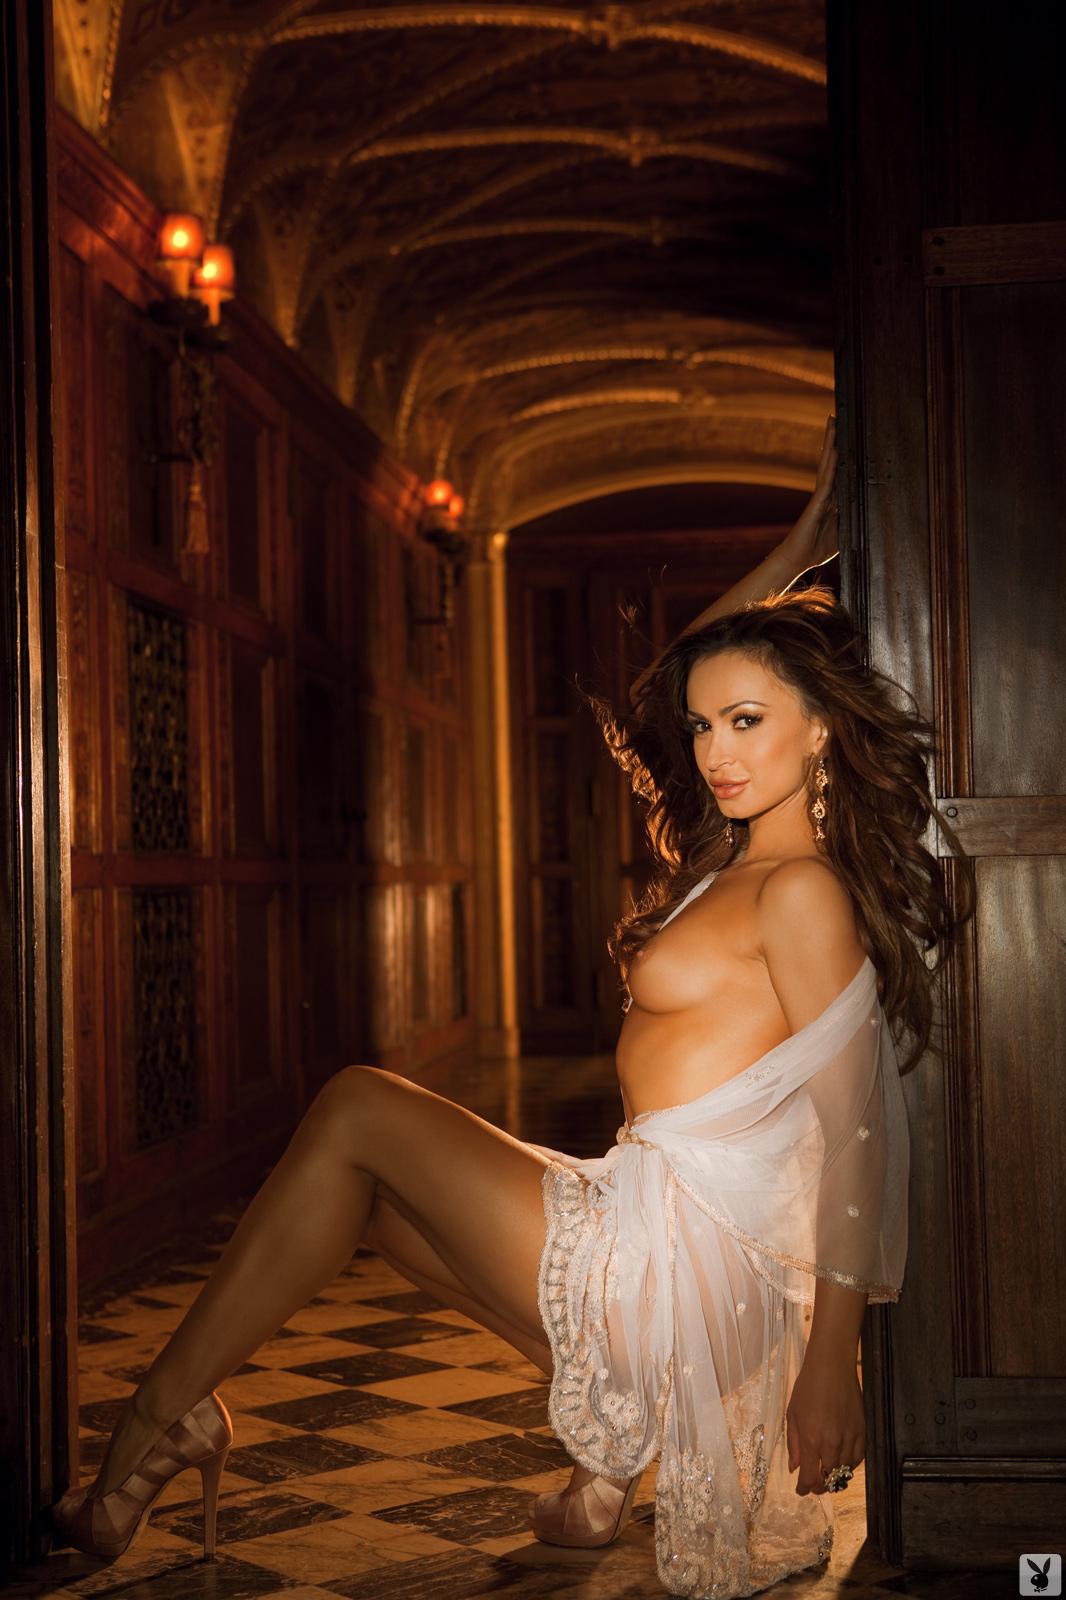 Karina%2BSmirnoff%2BNude%2BPlayboy%2BPhotos%2Bwww.GutterUncensored.com%2B017 ... Network updates: 3+ / day; free no membership live nude cams